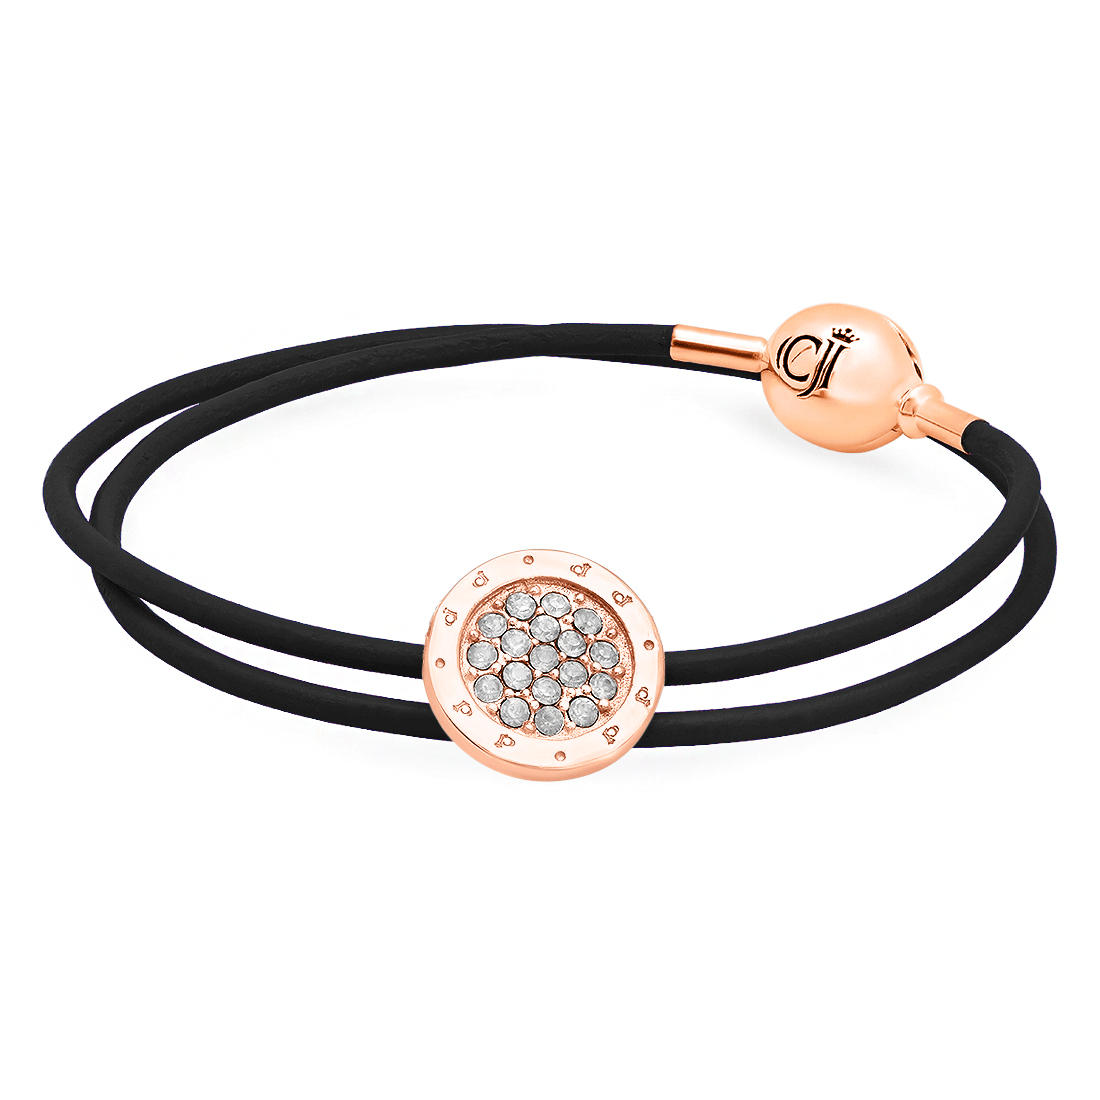 CJ Minimalista White Opal Ingenuity Rose Silver Necklace